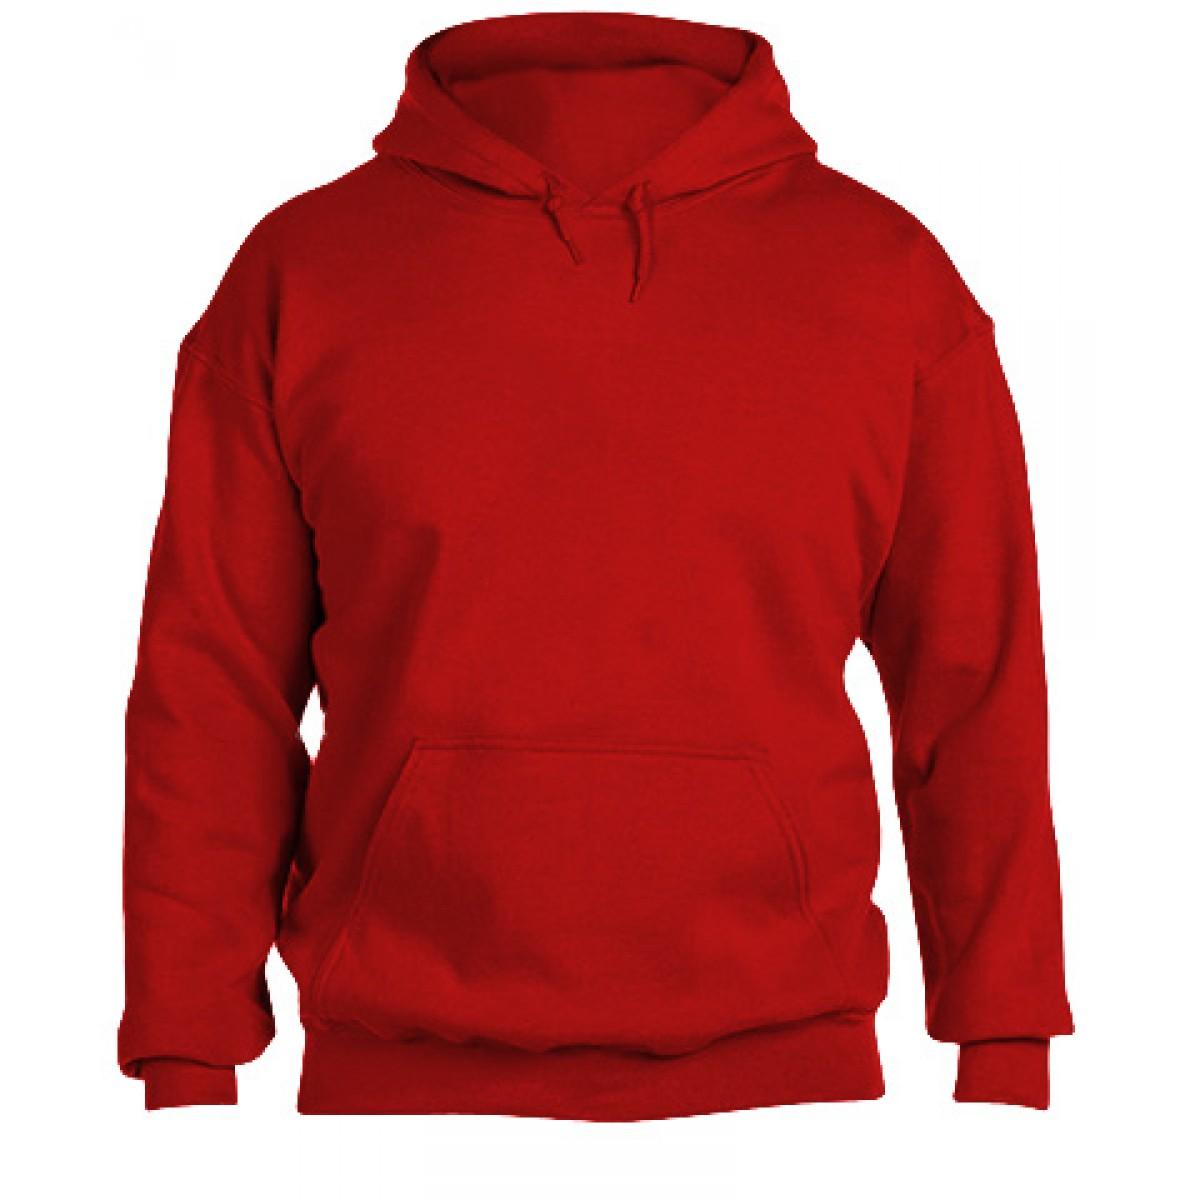 Hooded Sweatshirt  50/50 Heavy Blend-Cardinal Red-YS